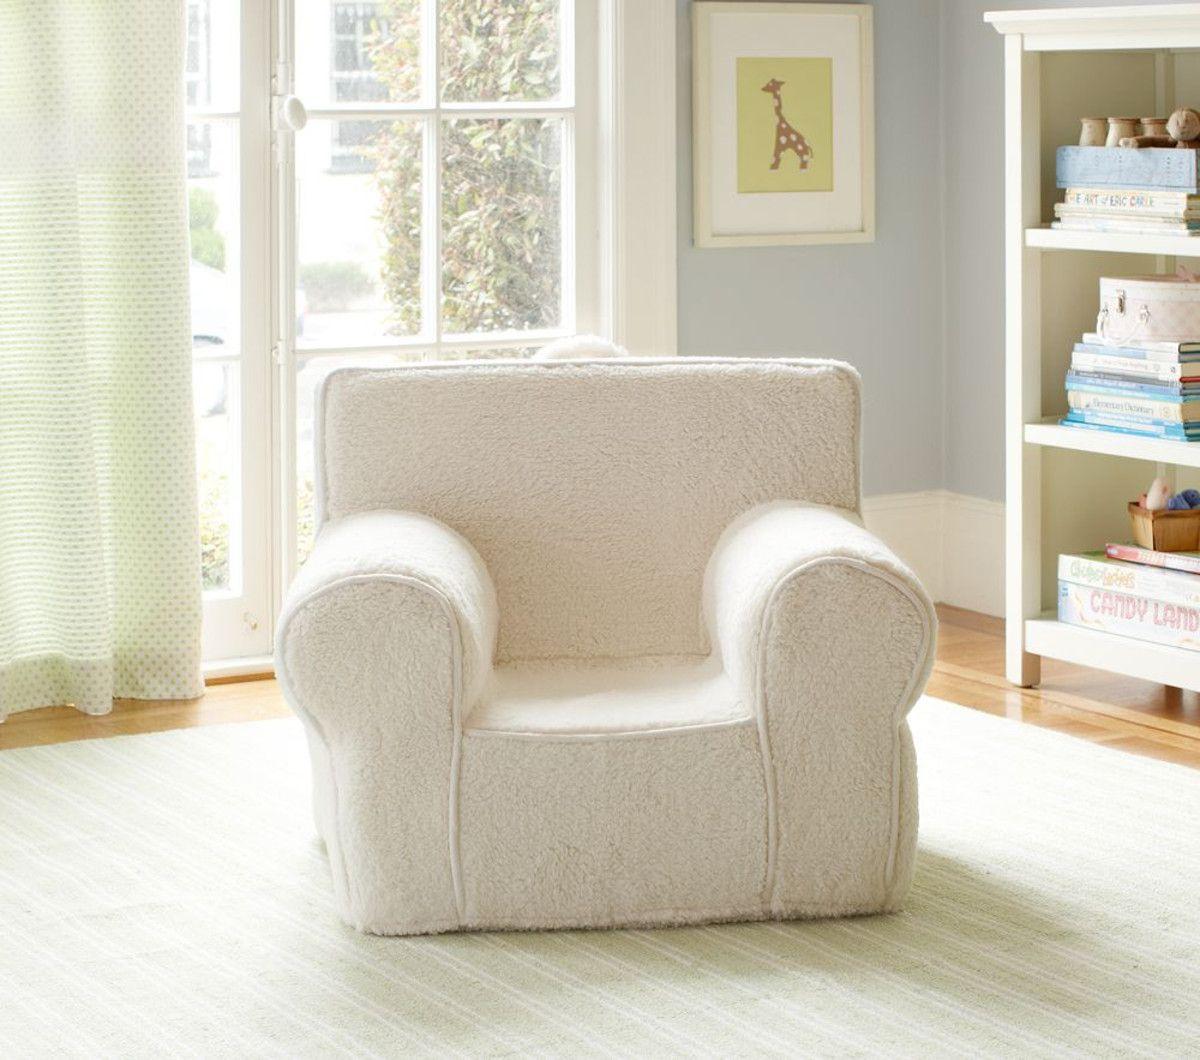 Cream sherpa anywhere chair pottery barn anywhere chair